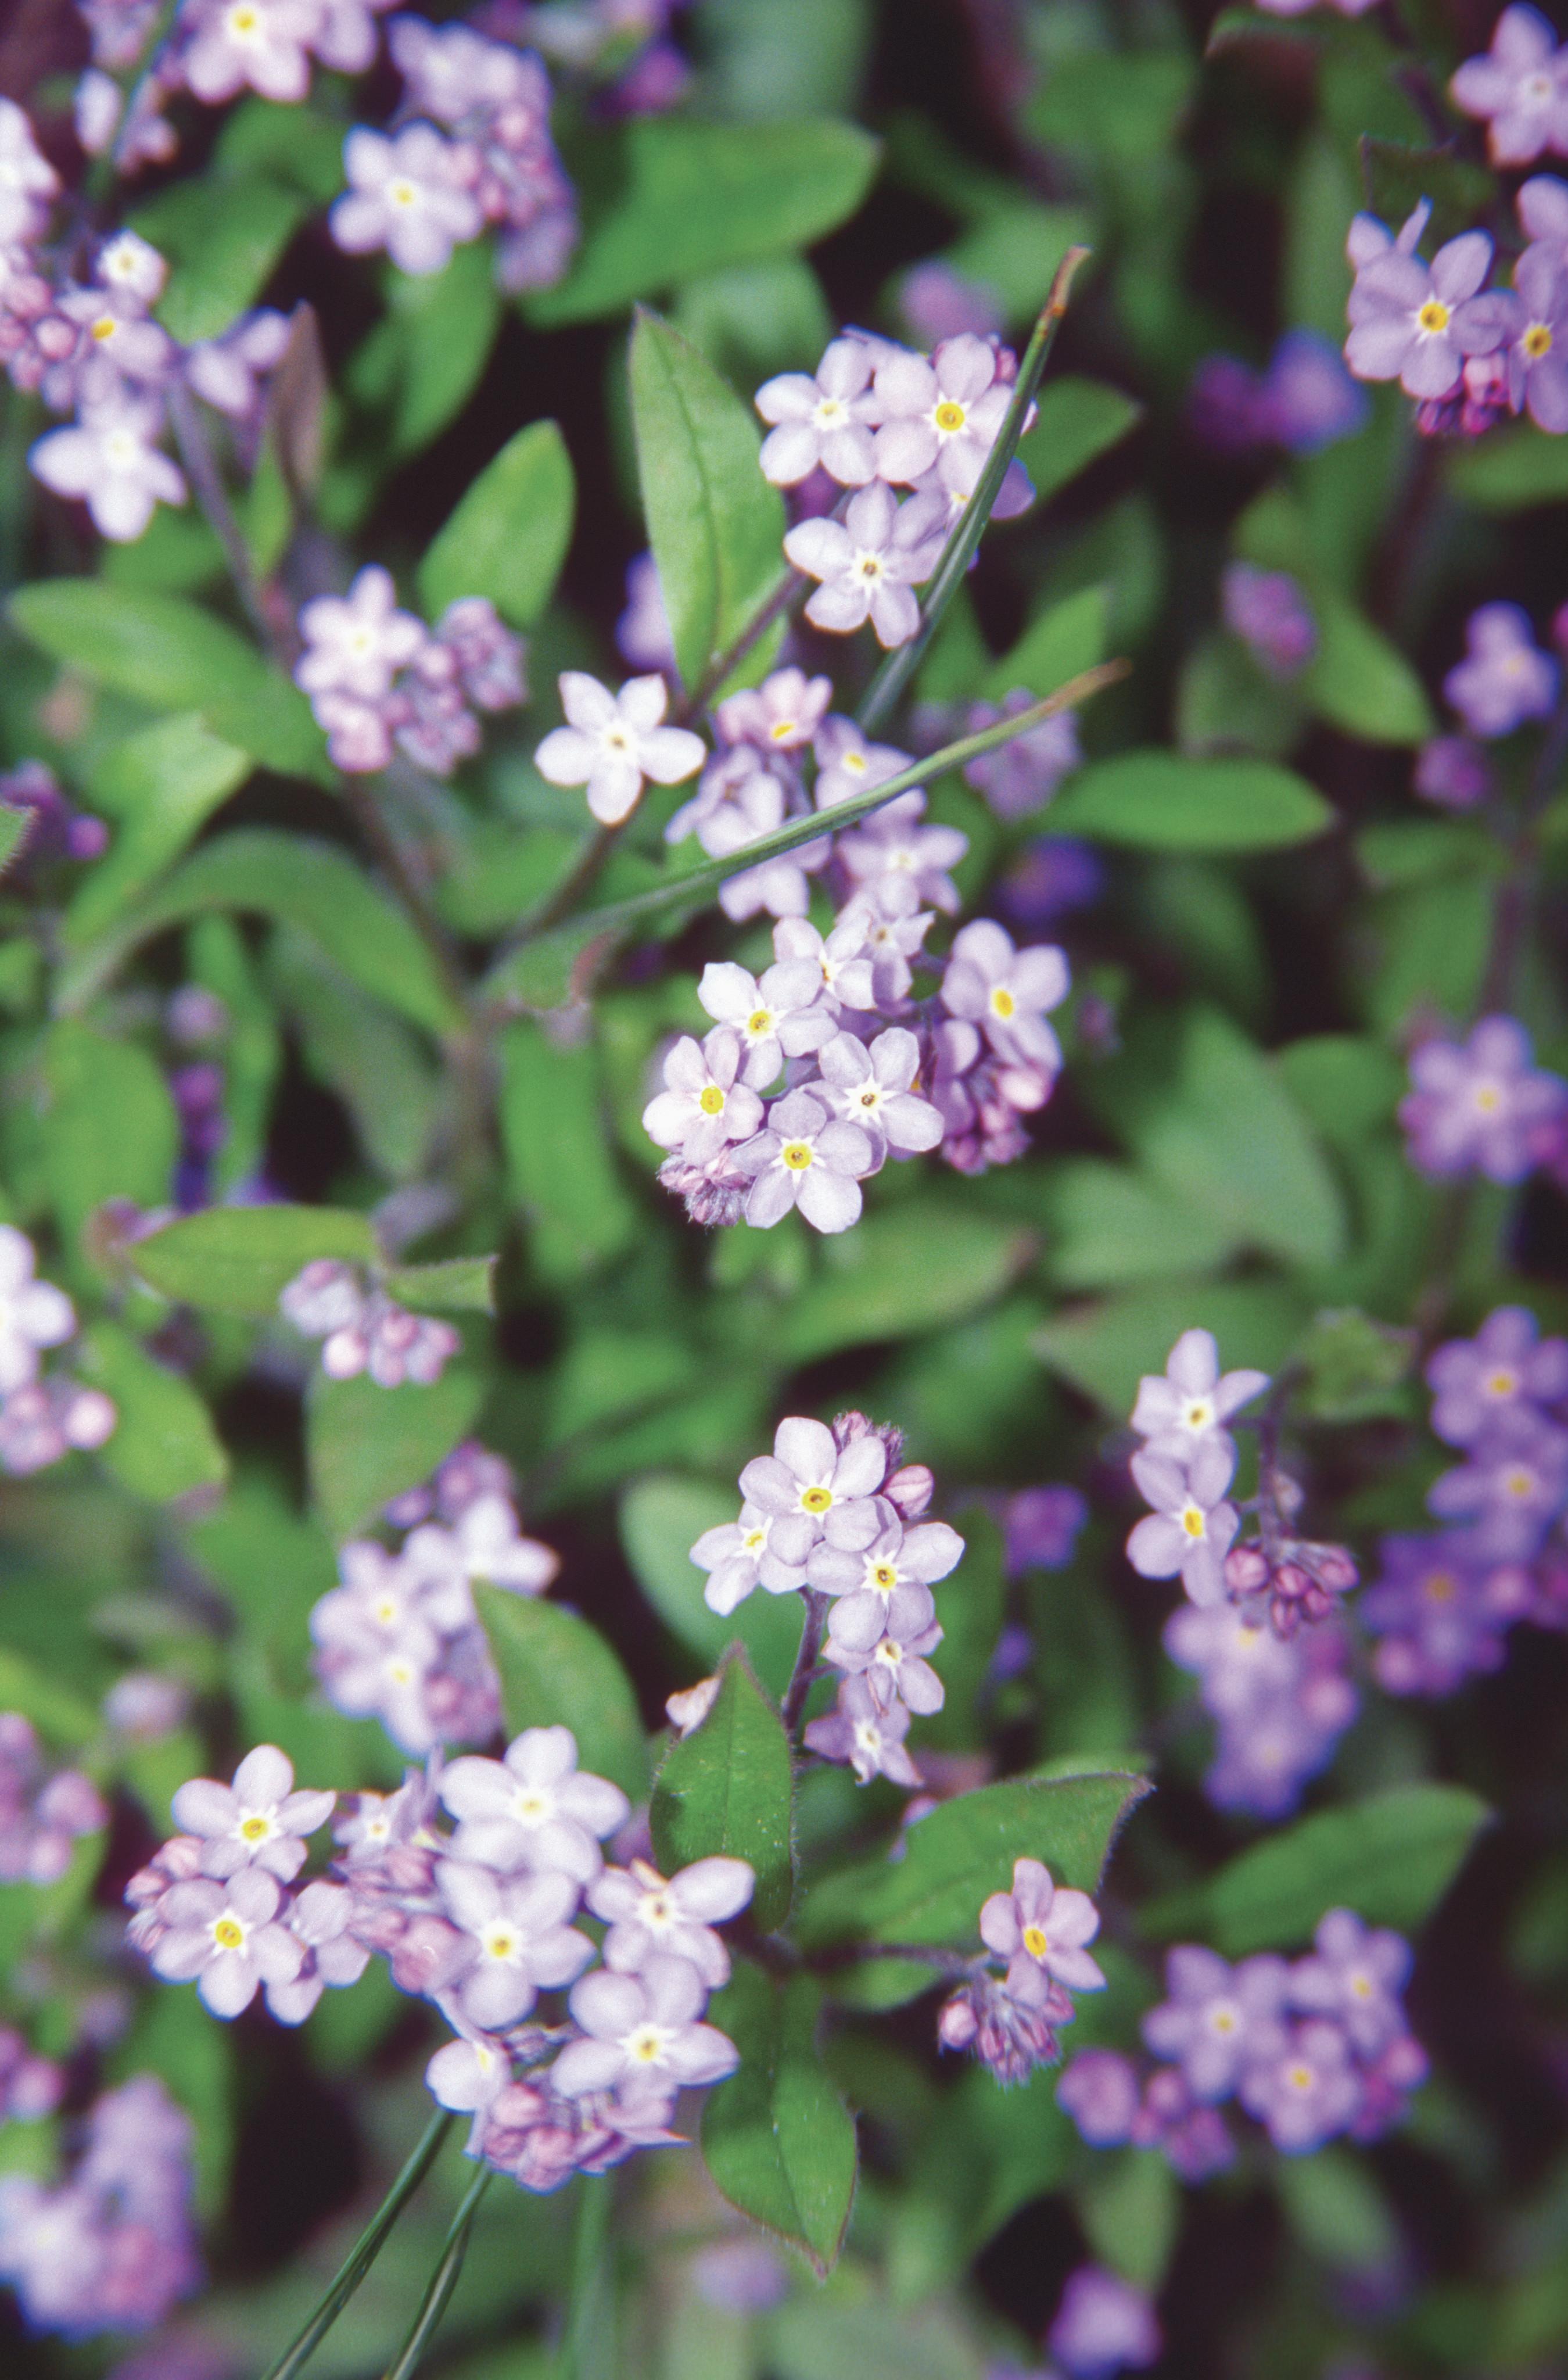 close up of alaskas state flower the for me not usa 2 Alaska